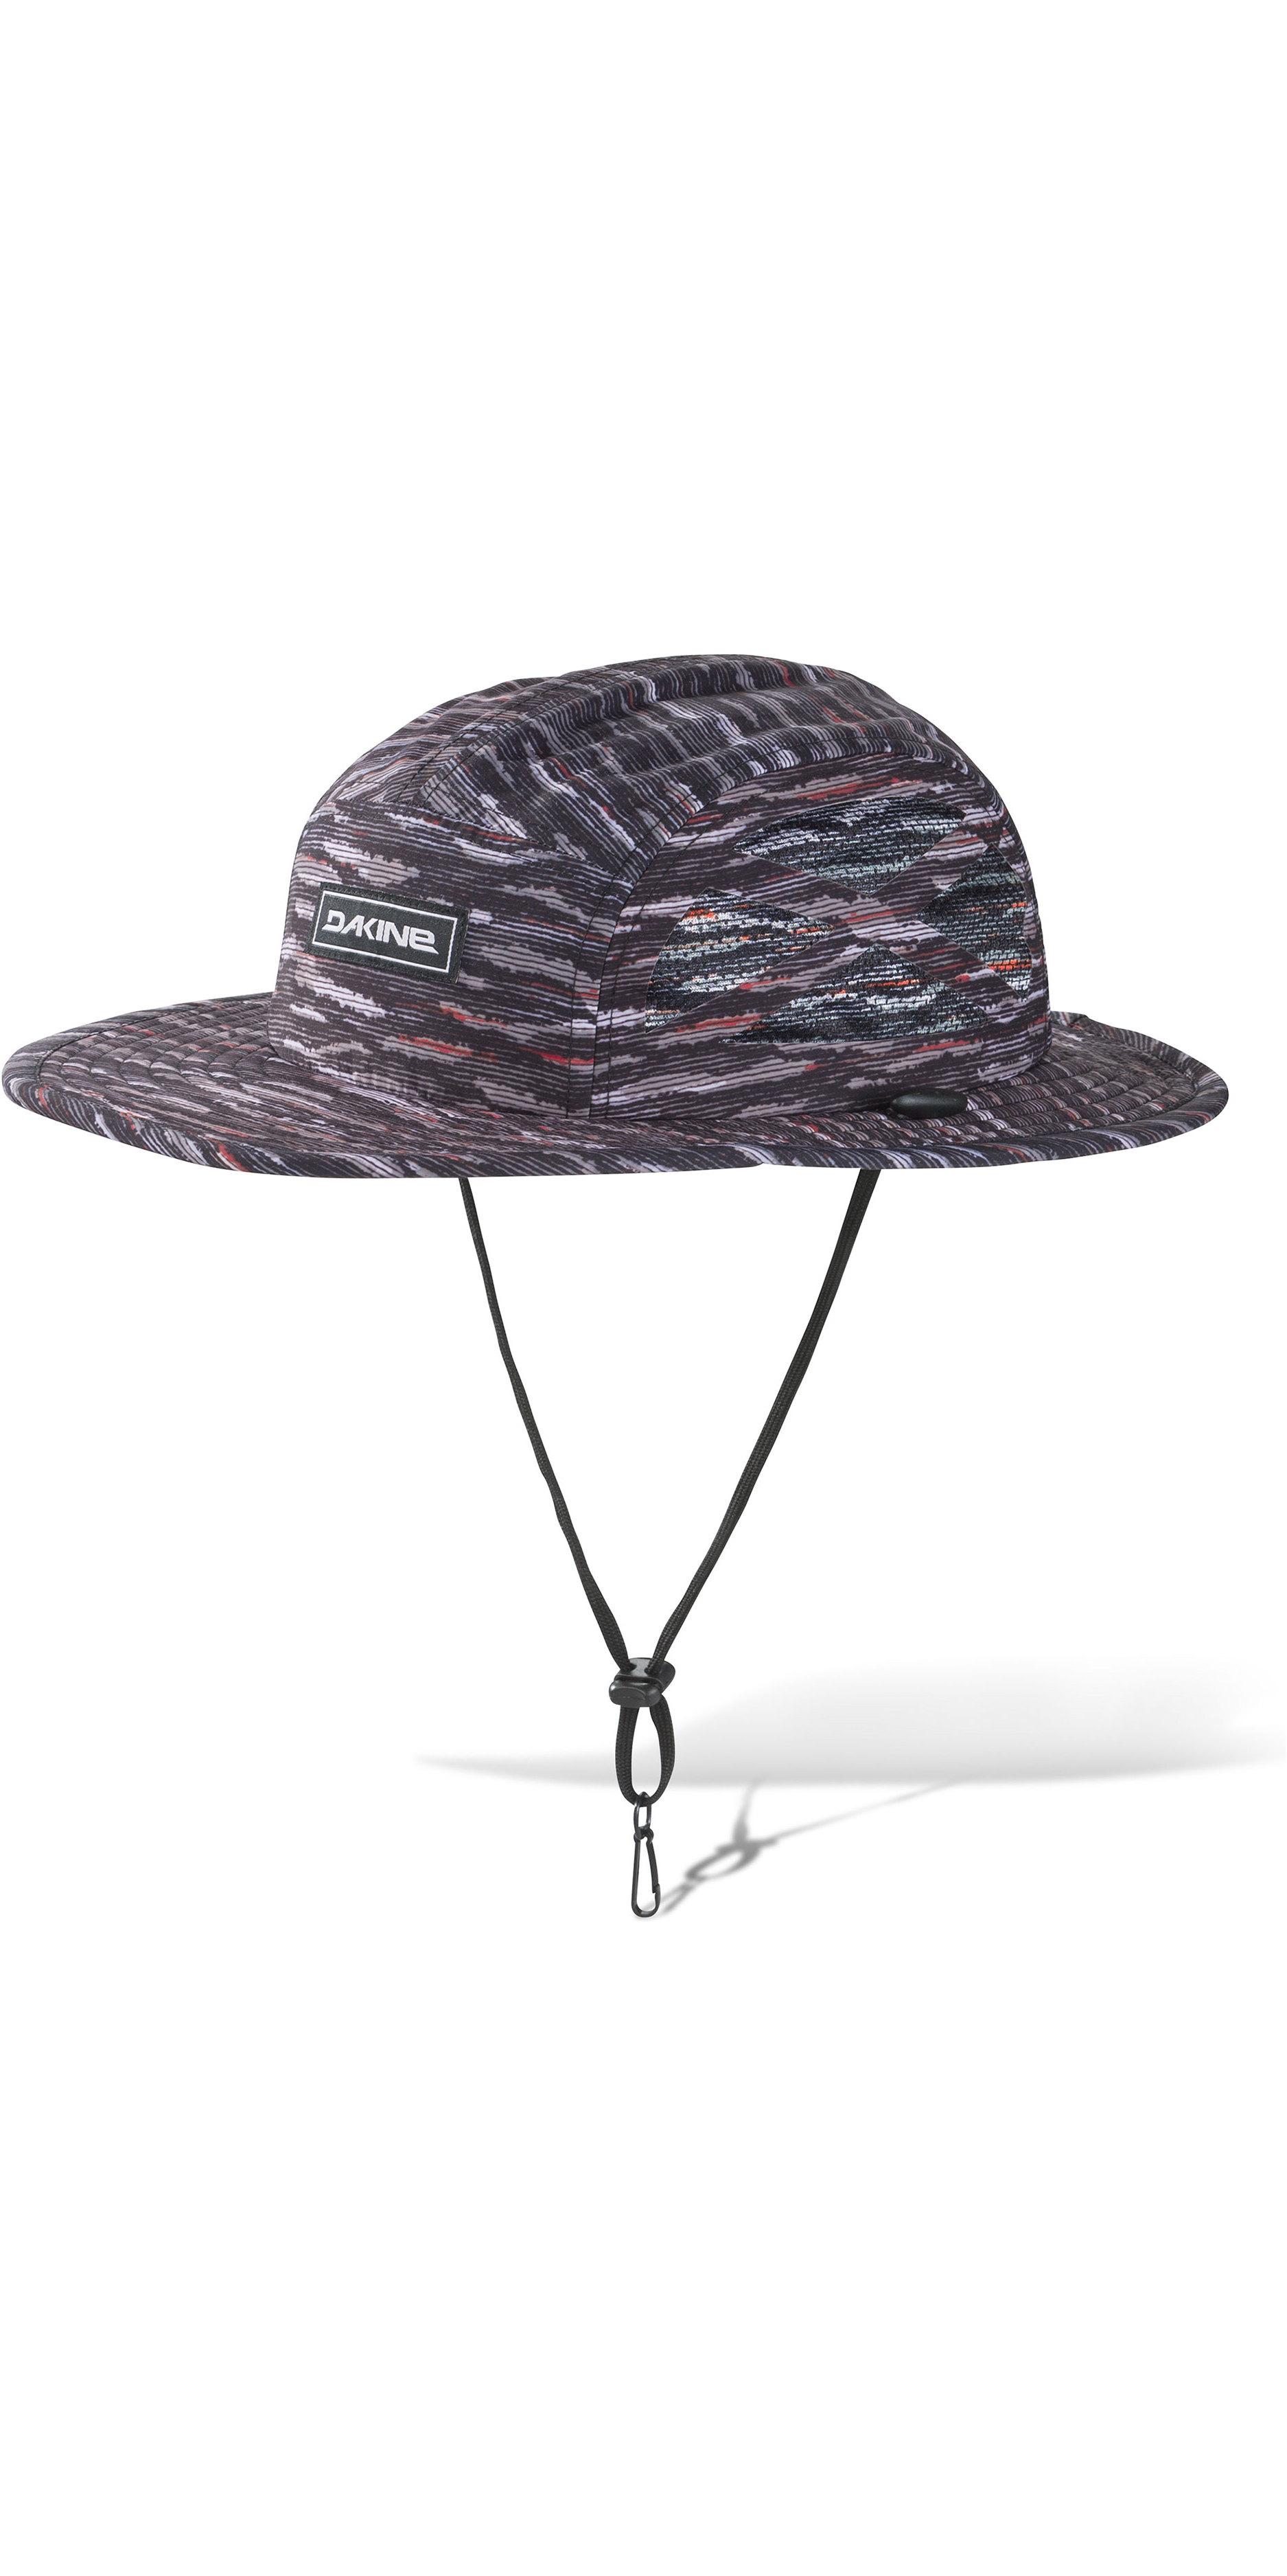 2019 Dakine Kahu Surf Hat Static 10002457